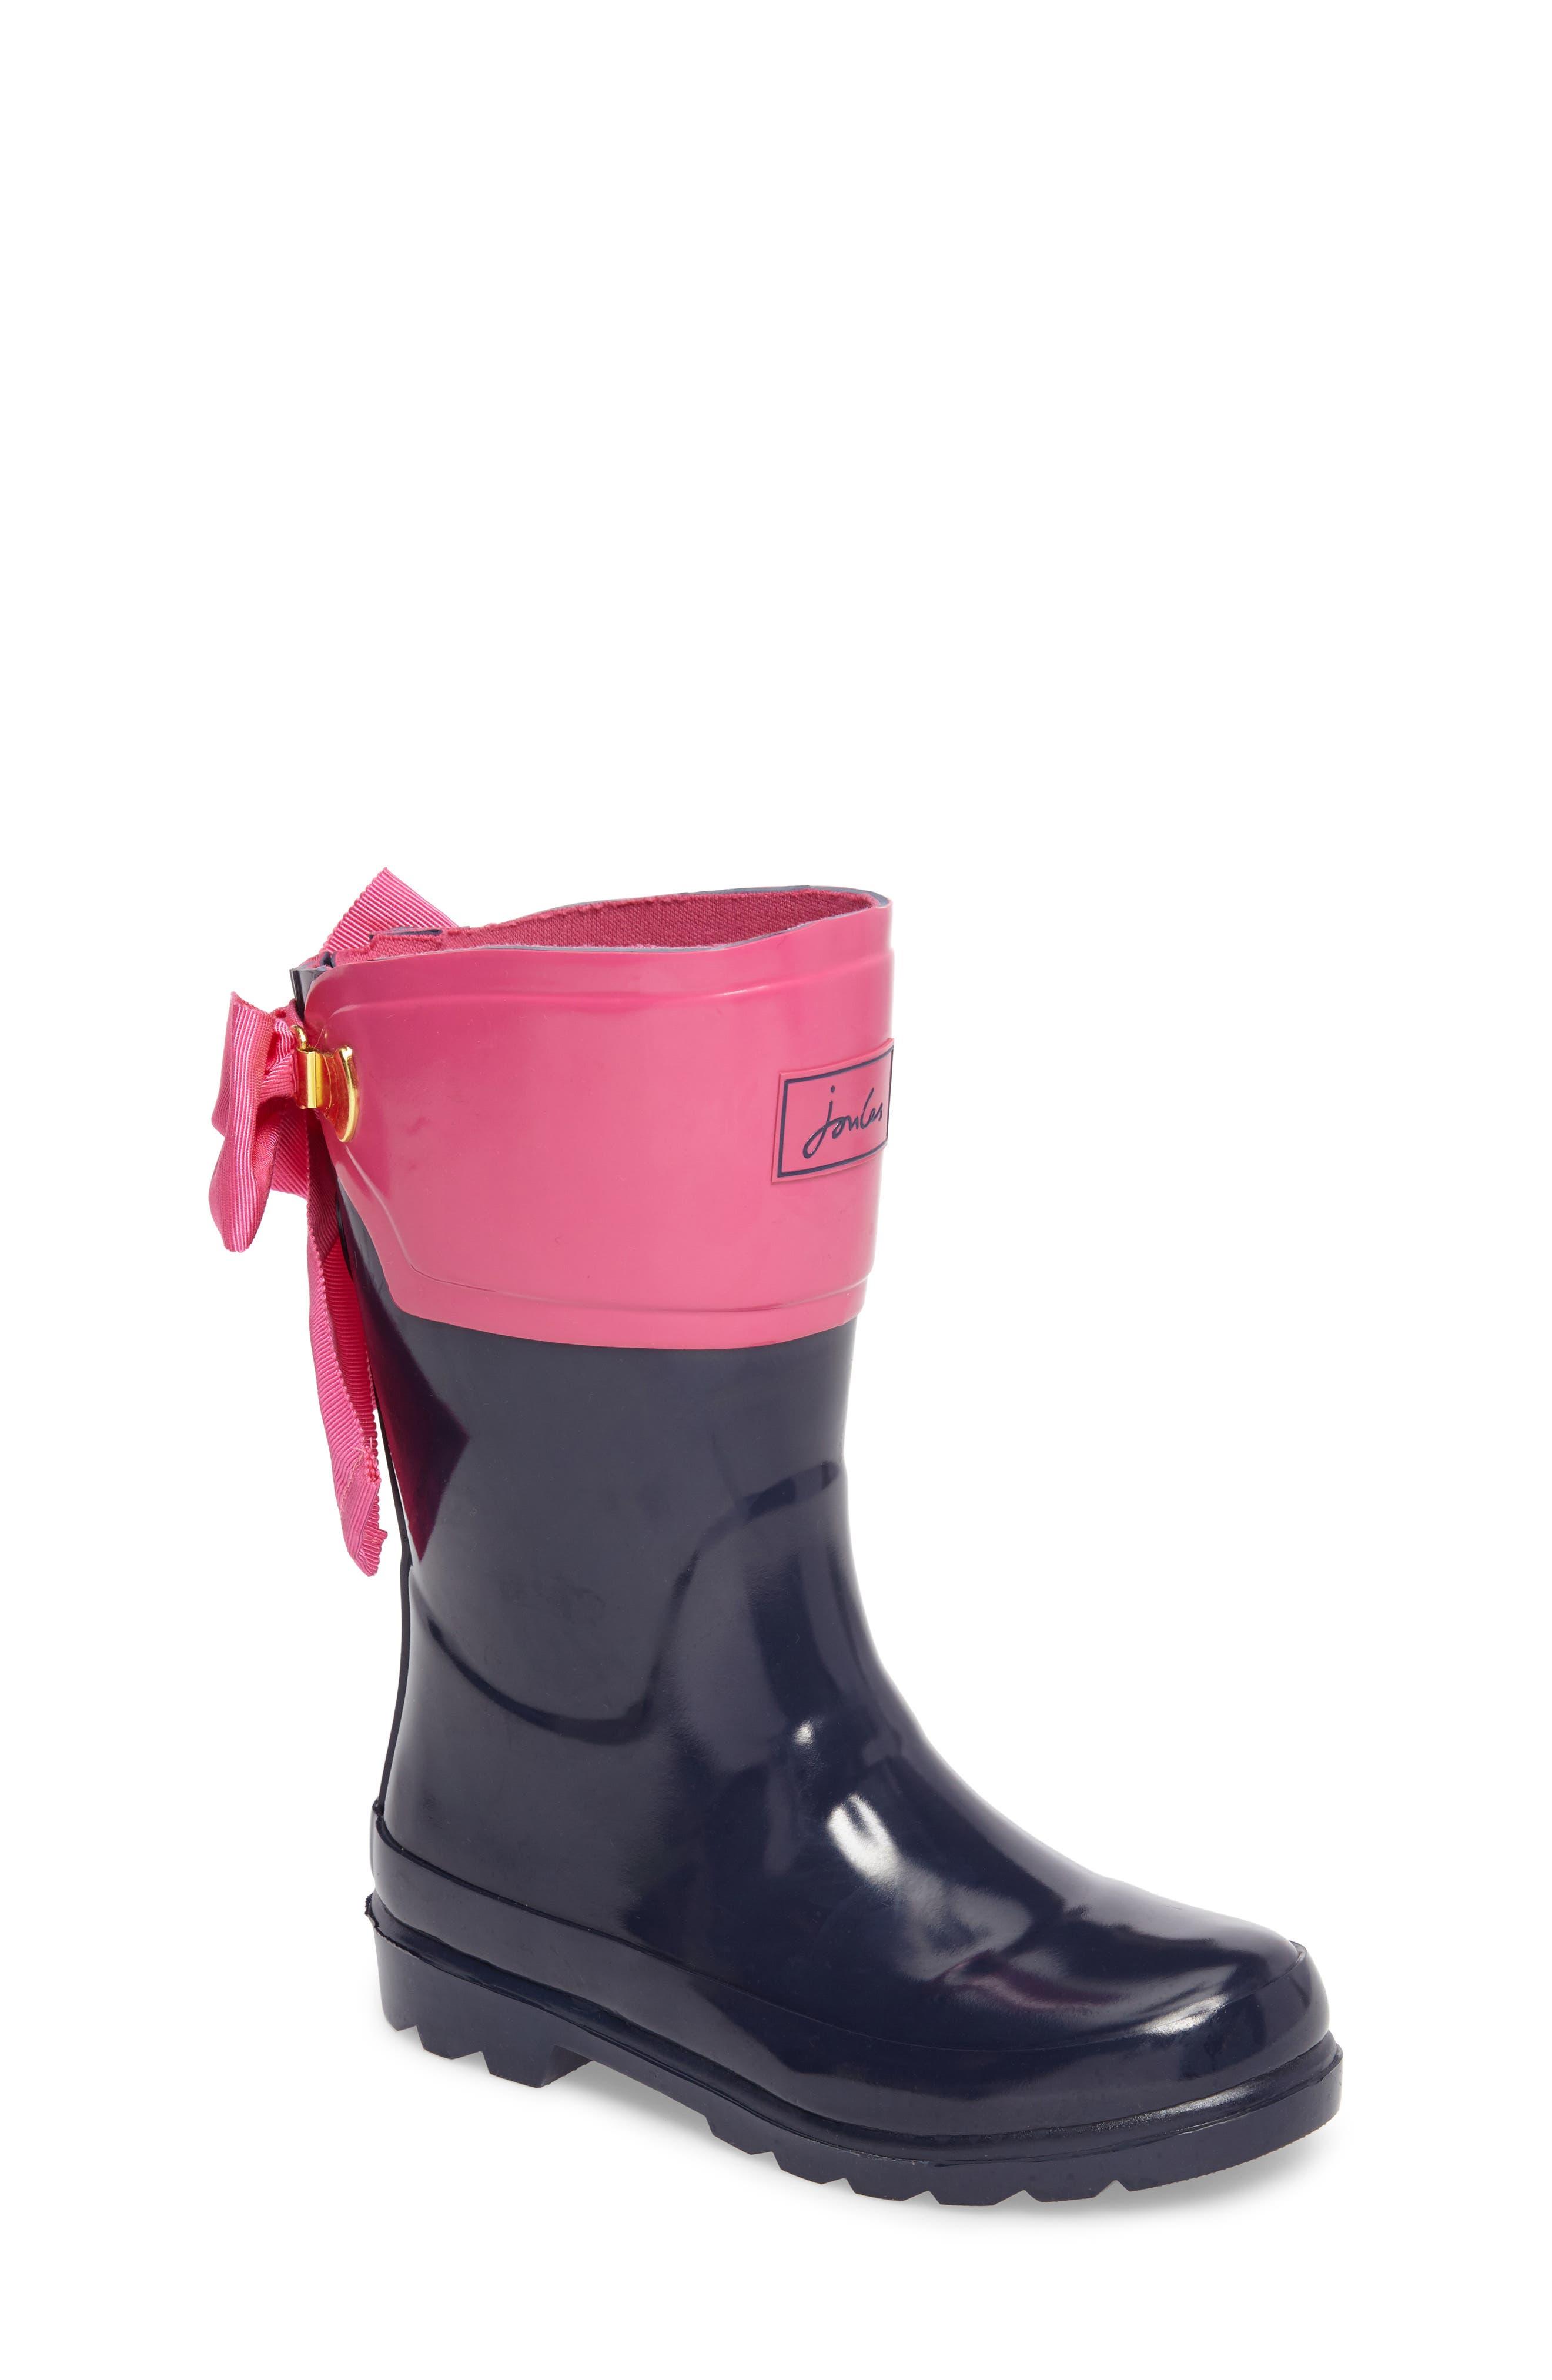 Evedon Bow Waterproof Rain Boot,                             Main thumbnail 1, color,                             400